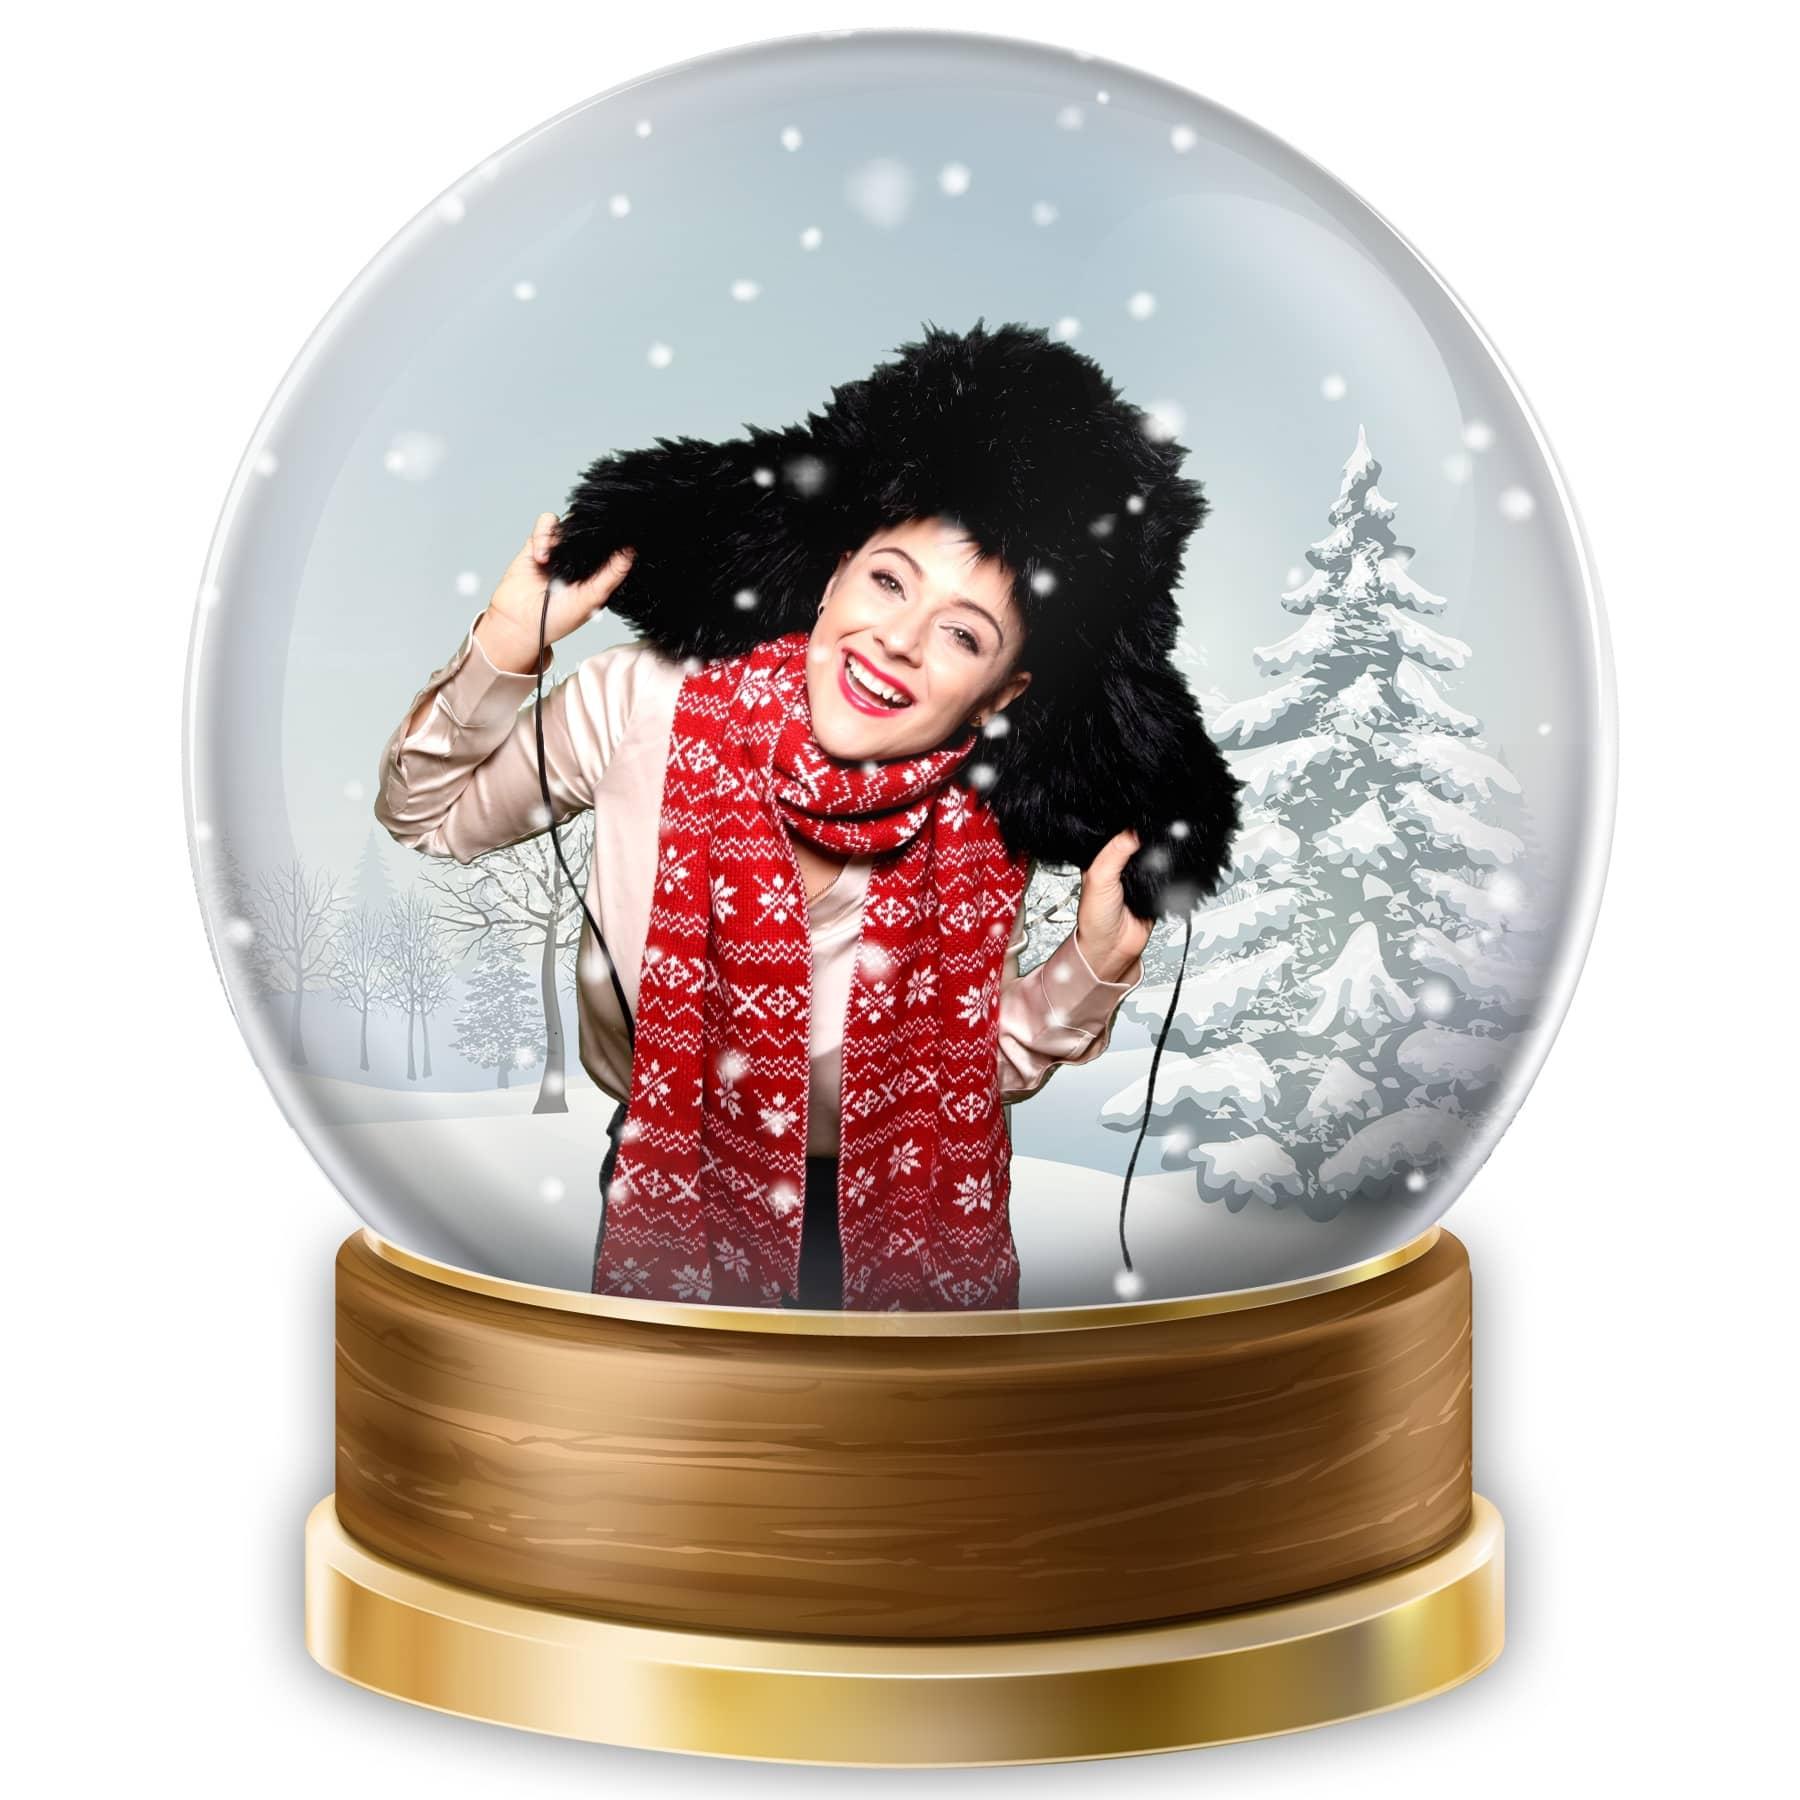 vianocna gula fotokutik vianocny vecierok FOTOKÚTIK.sk